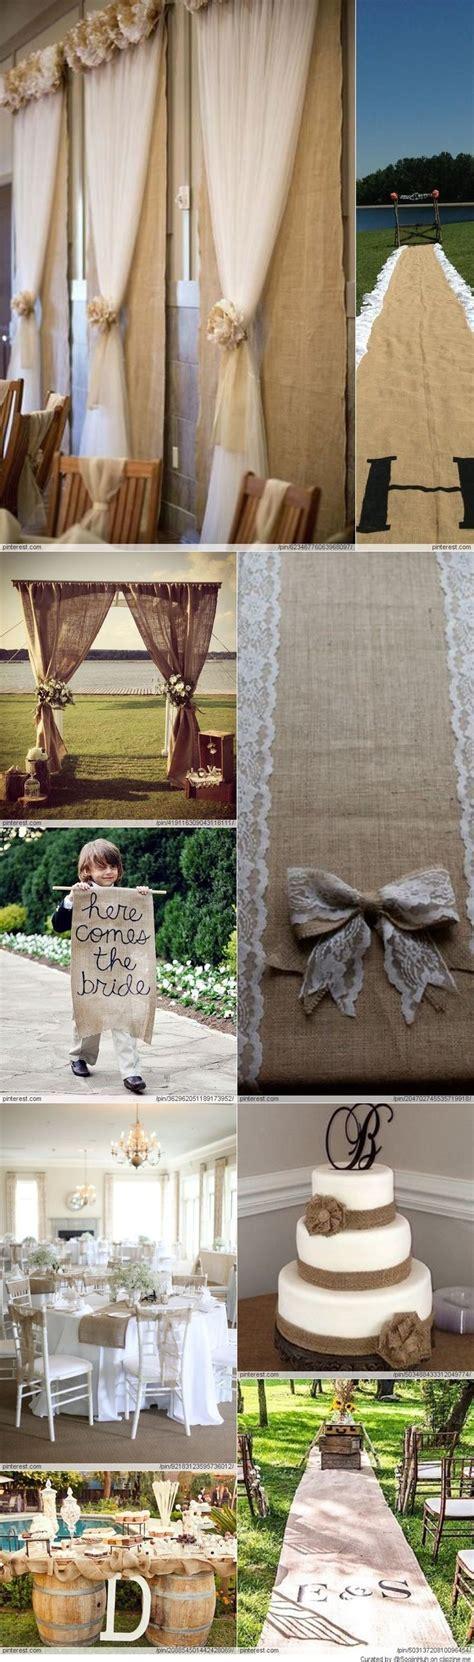 25  best ideas about Hessian wedding on Pinterest   Rustic